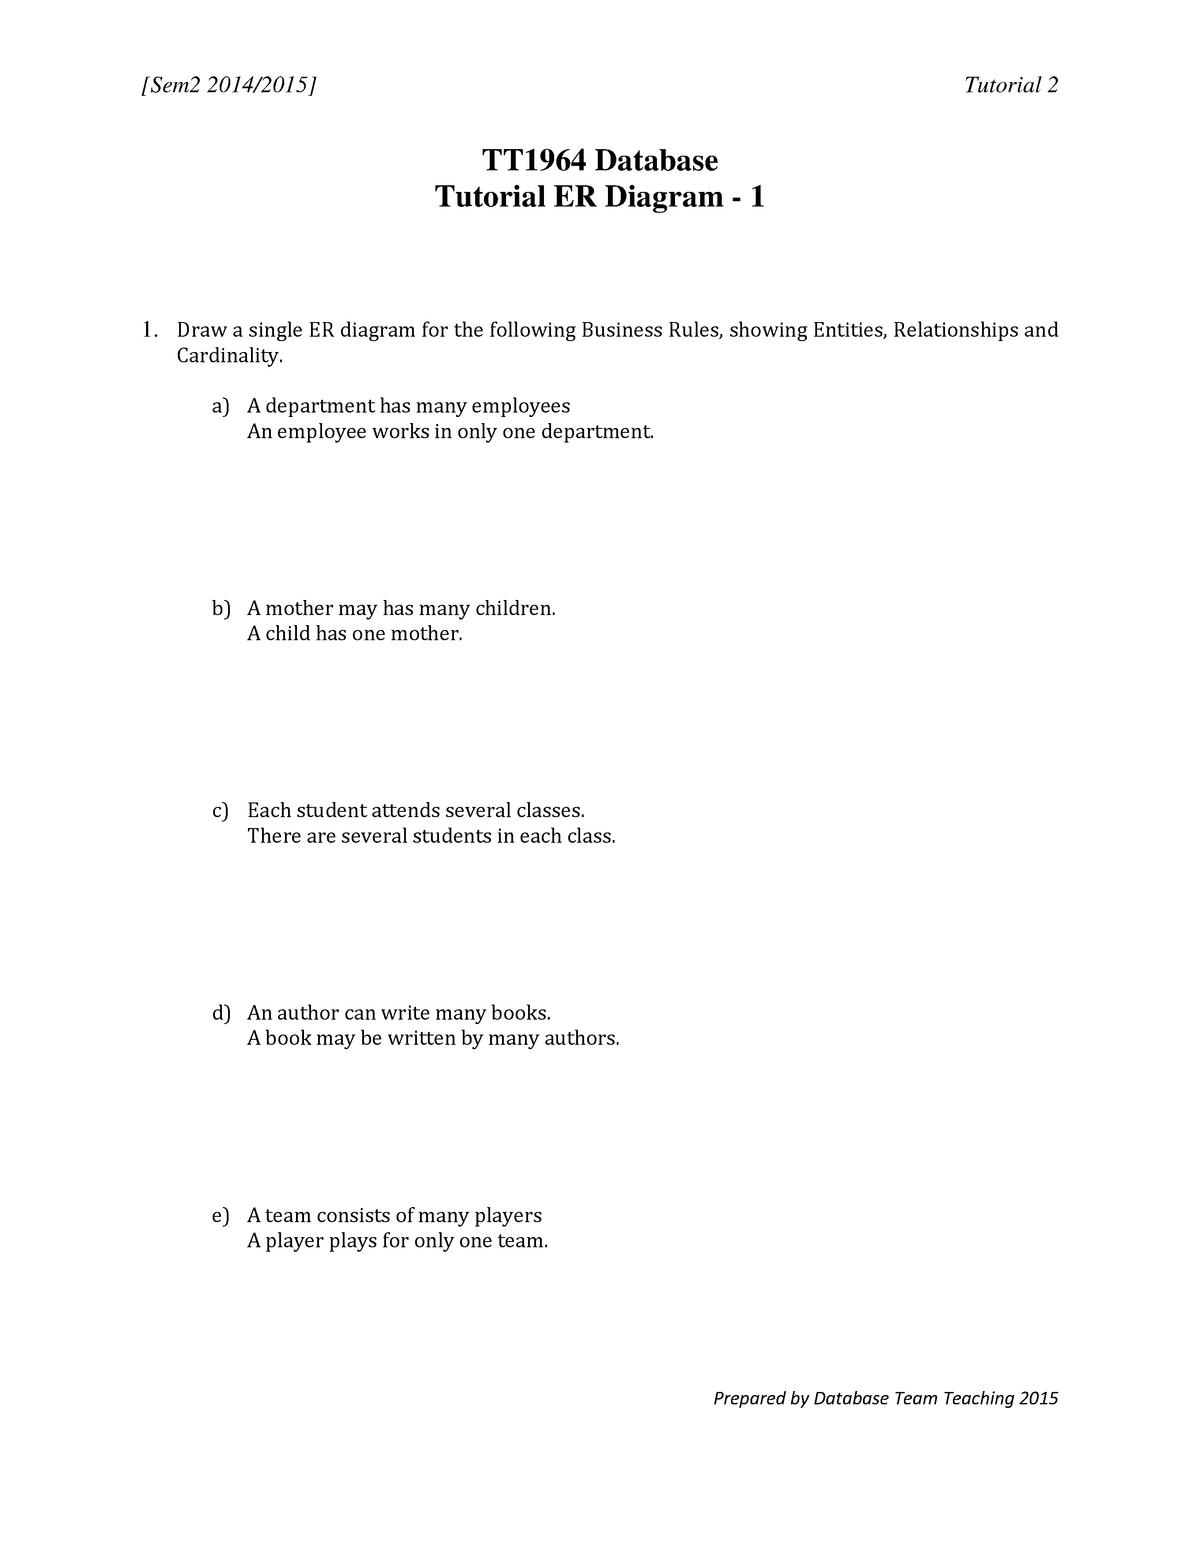 Tutorial 2 Database - TTTT1964: Database - StuDocu